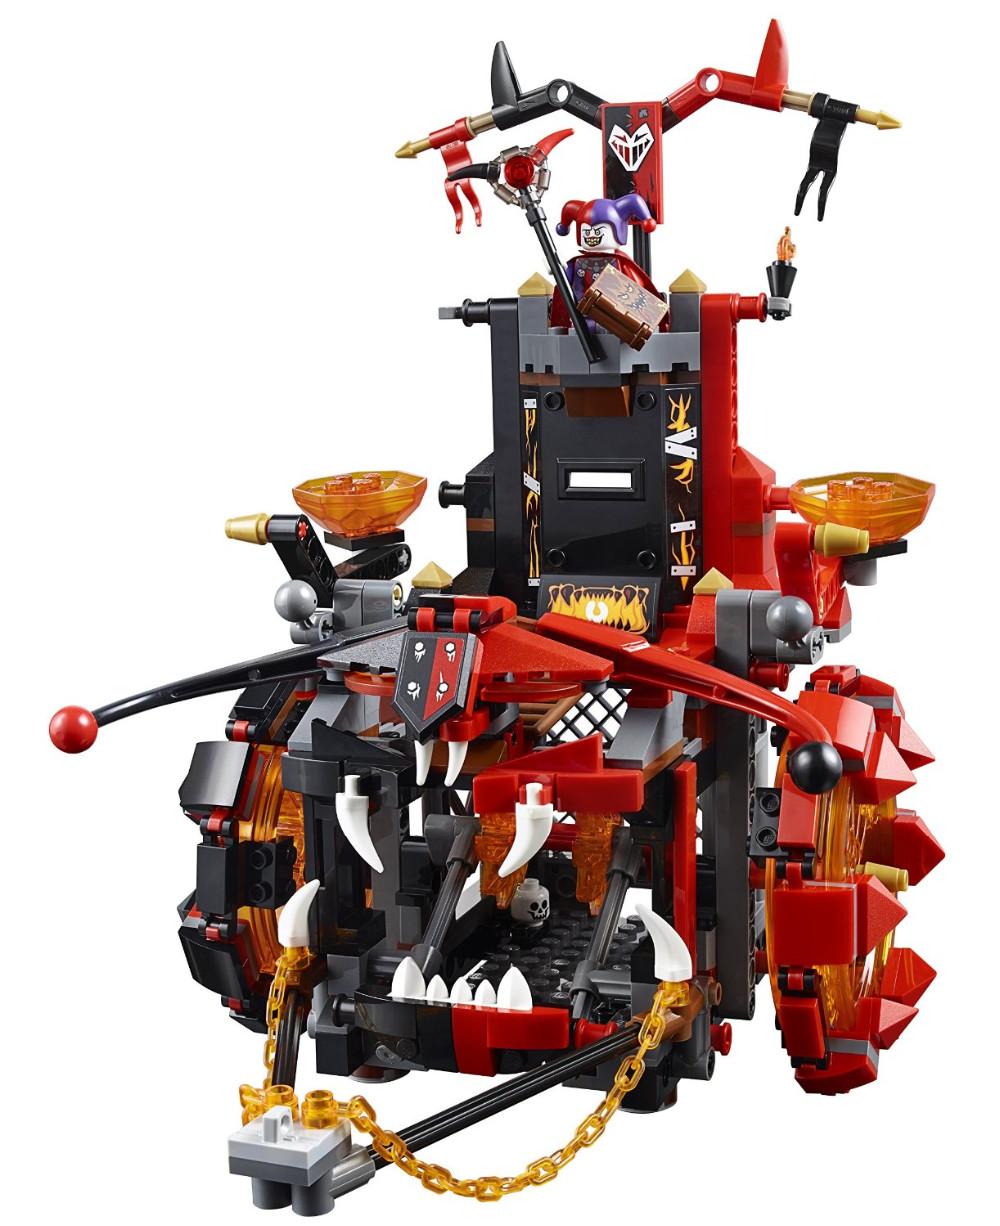 UKLego Nexo Knights Jestro's Evil Mobile Combination Marvel Building Blocks Kits Toys.